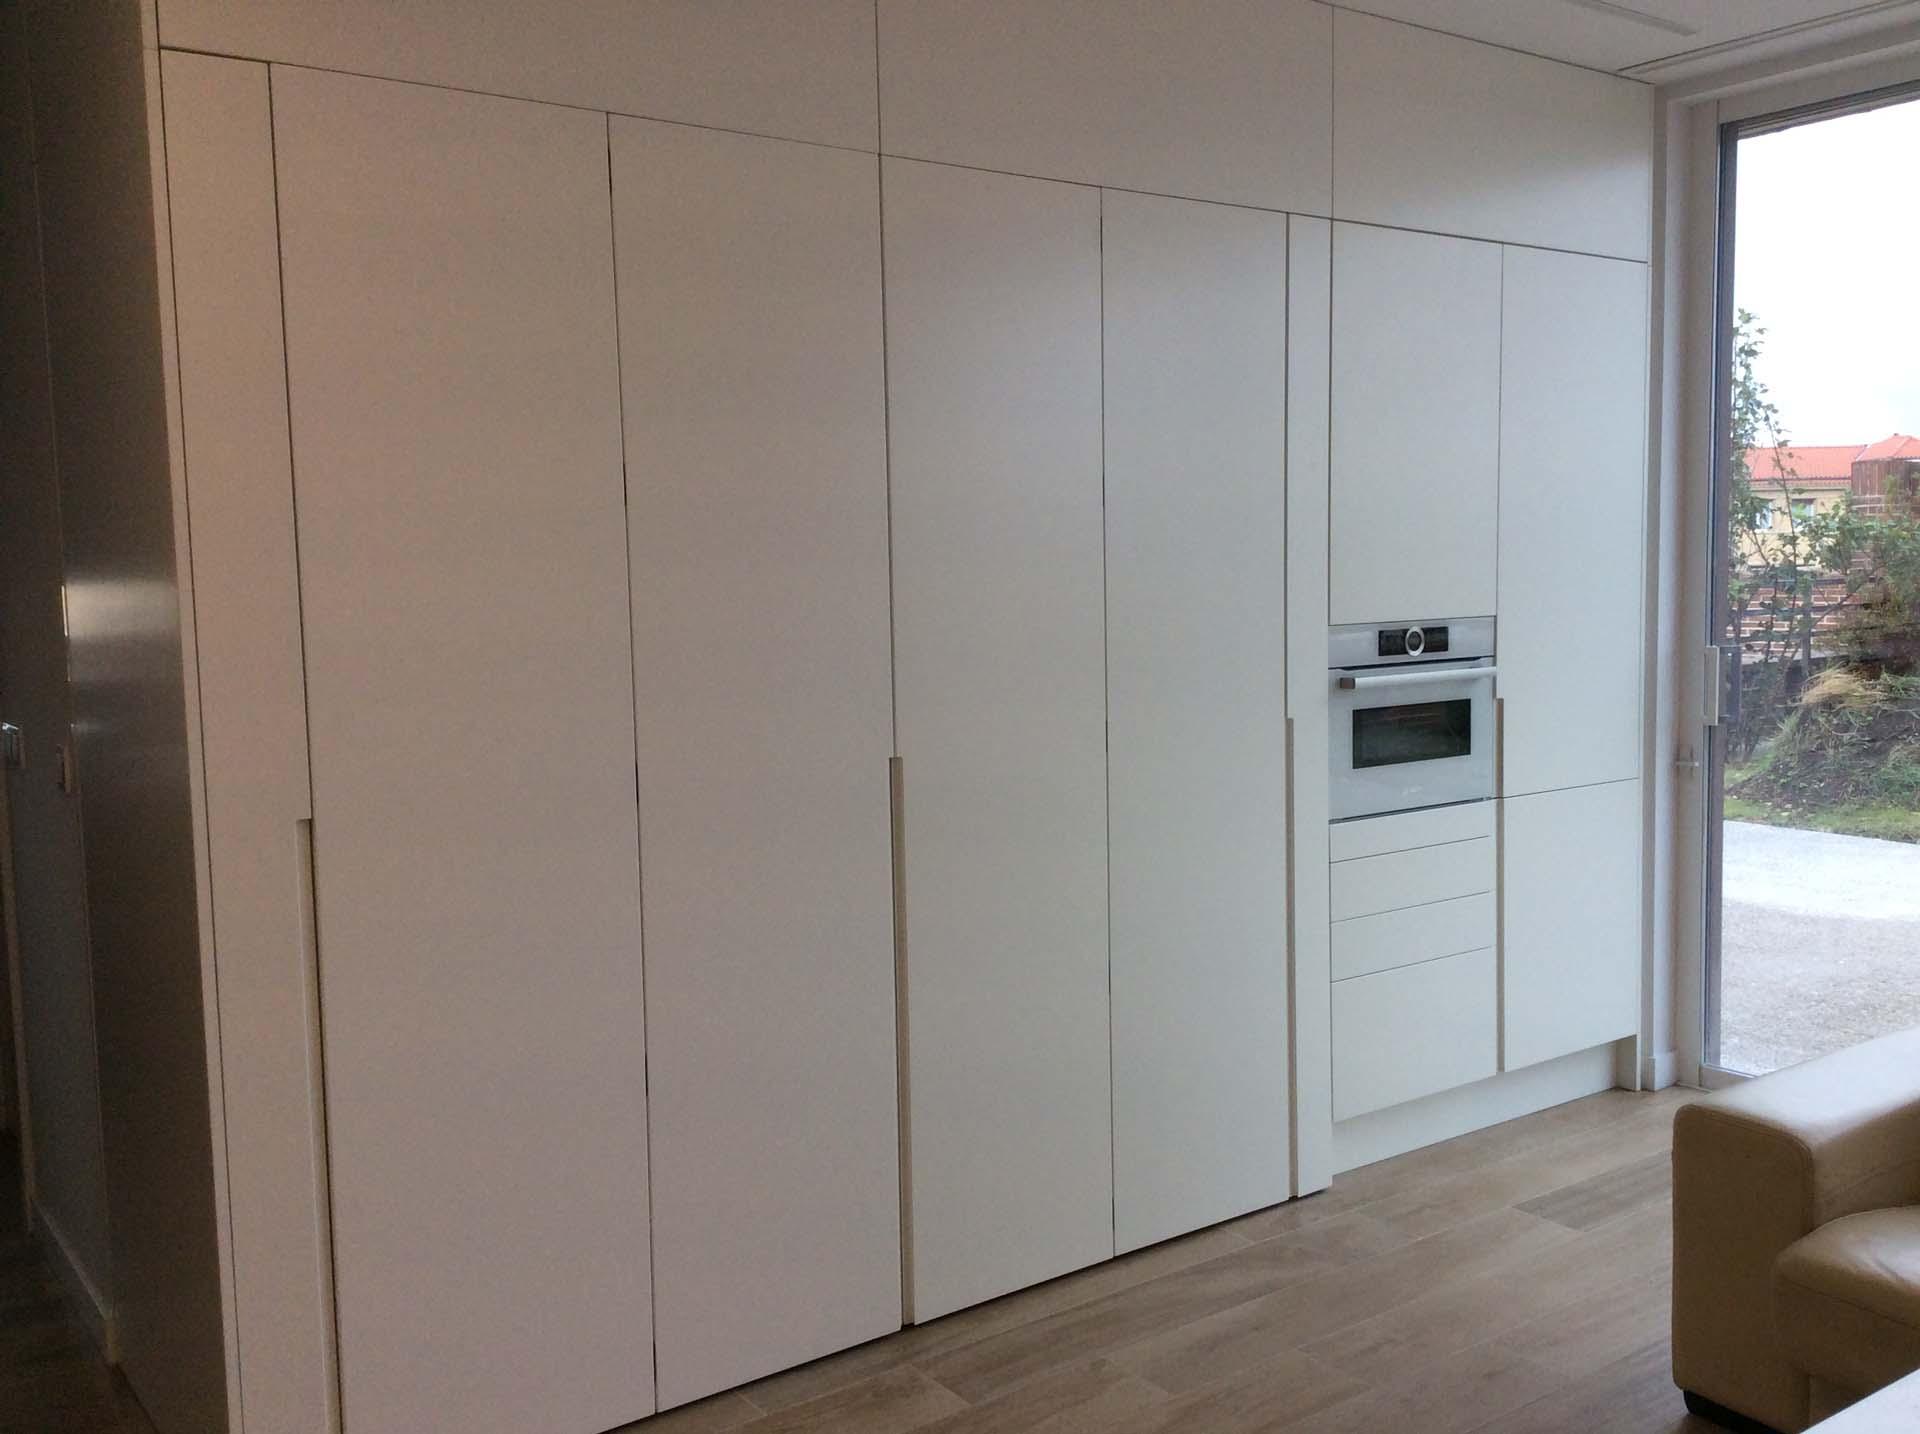 puertas escamoteables cerradas cocina arnit